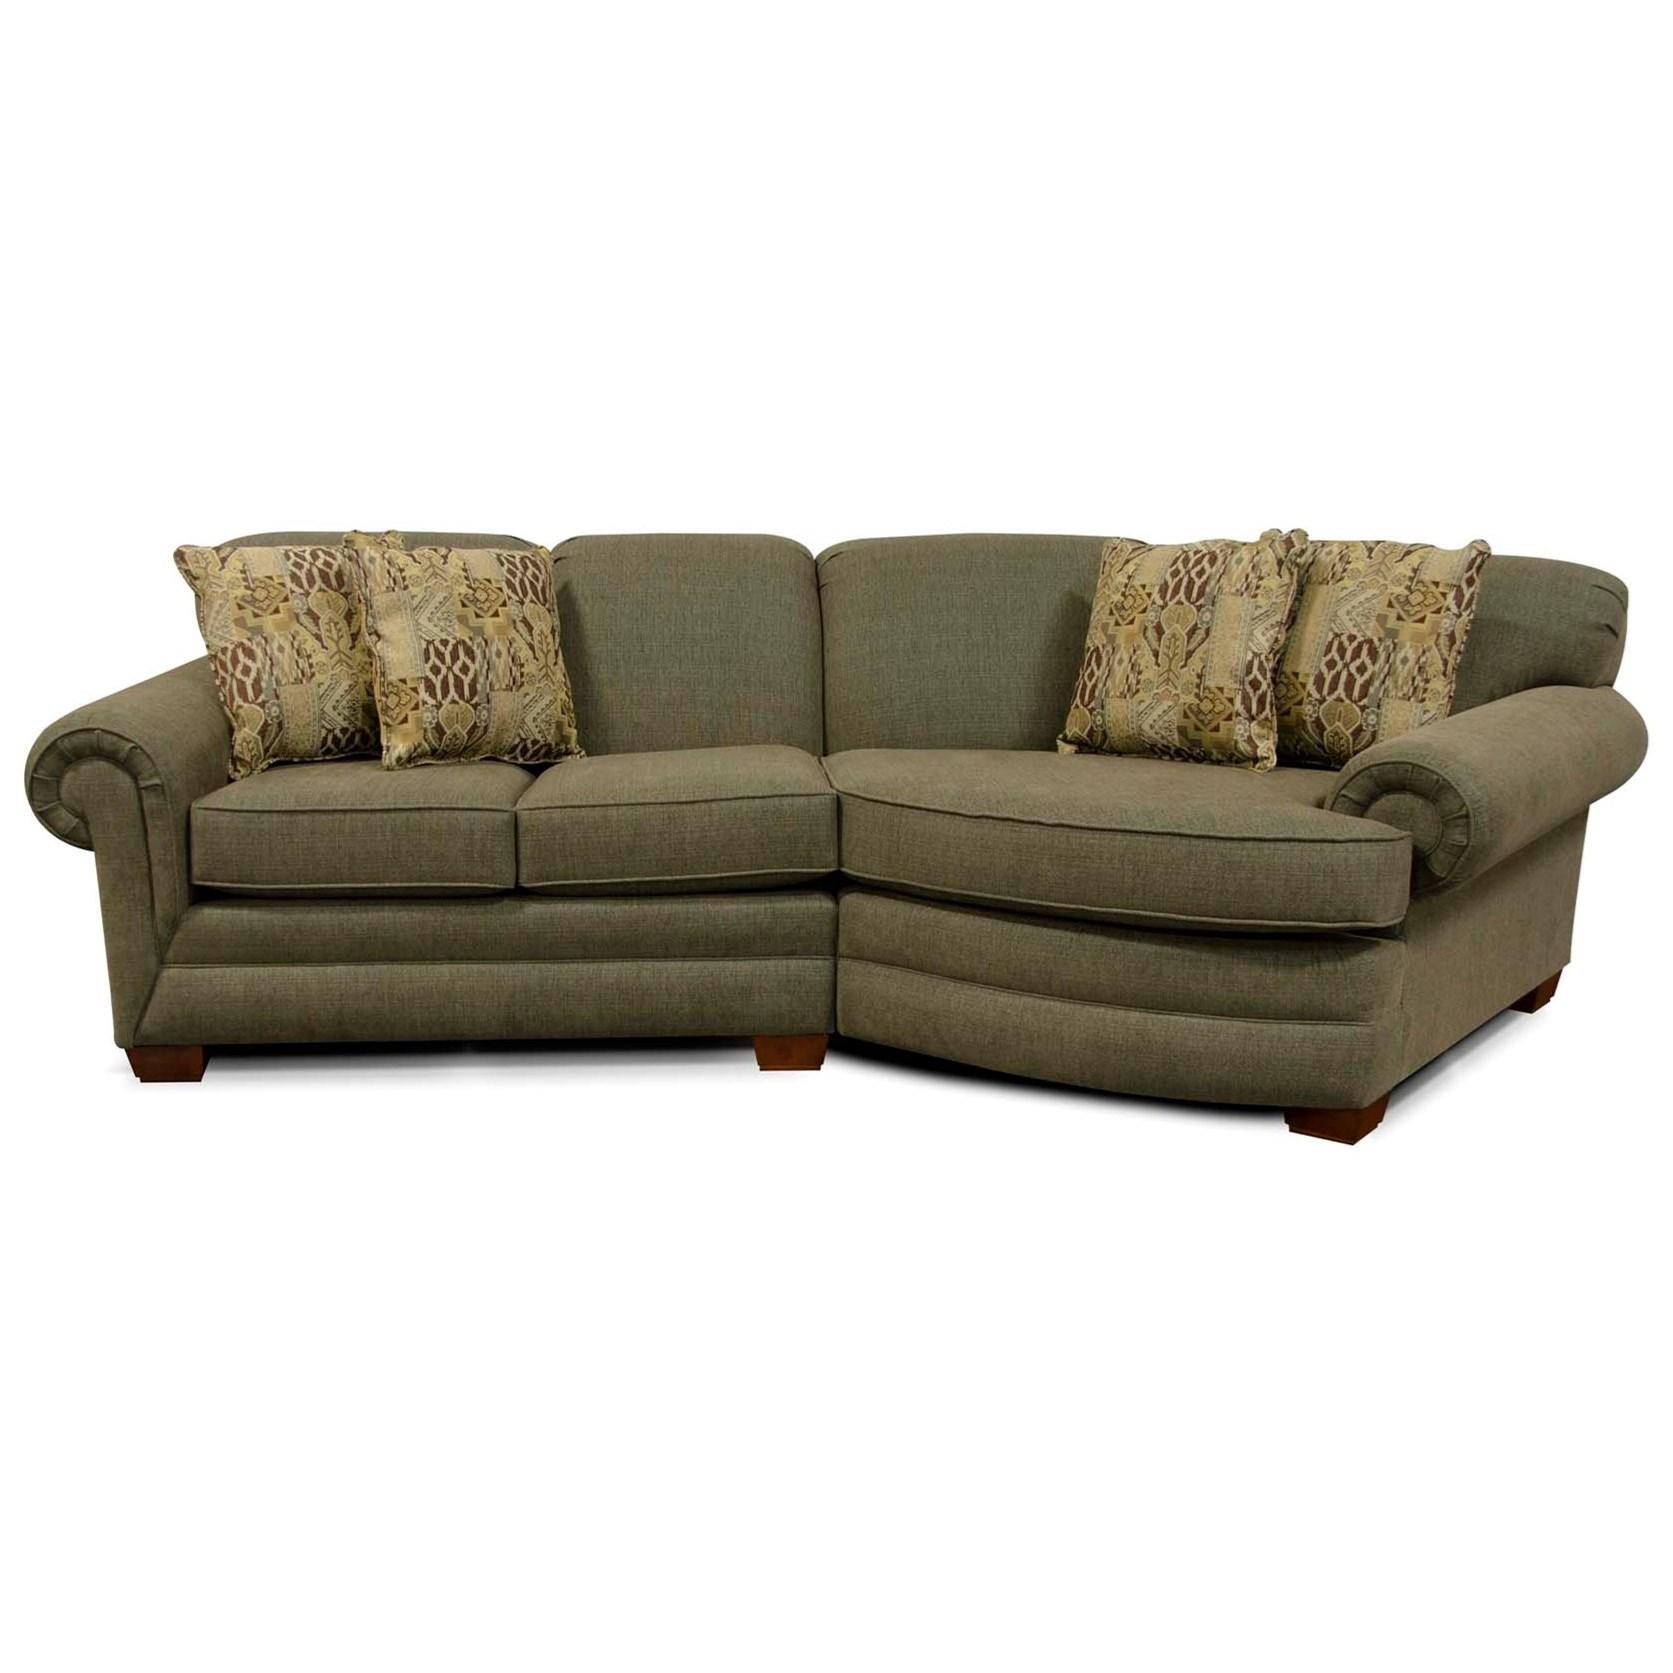 monroe sofa green cushions england small sectional boulevard home